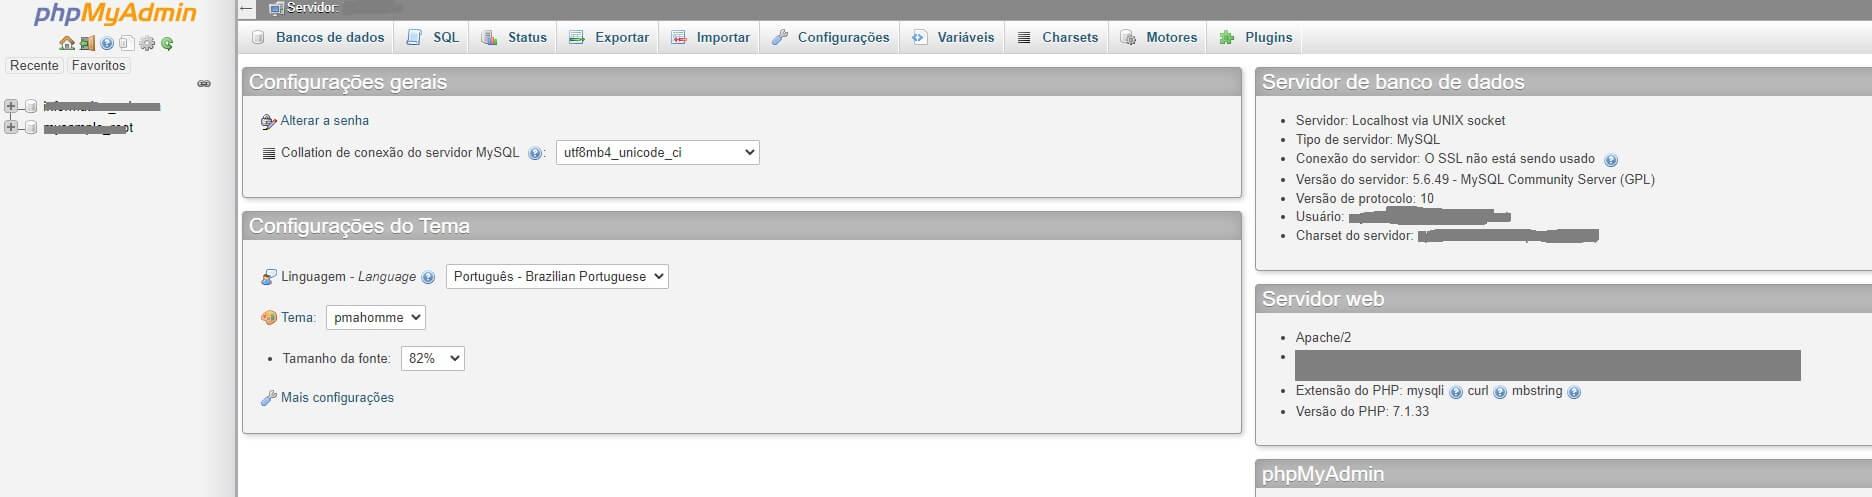 painel do PHPMyAdmin